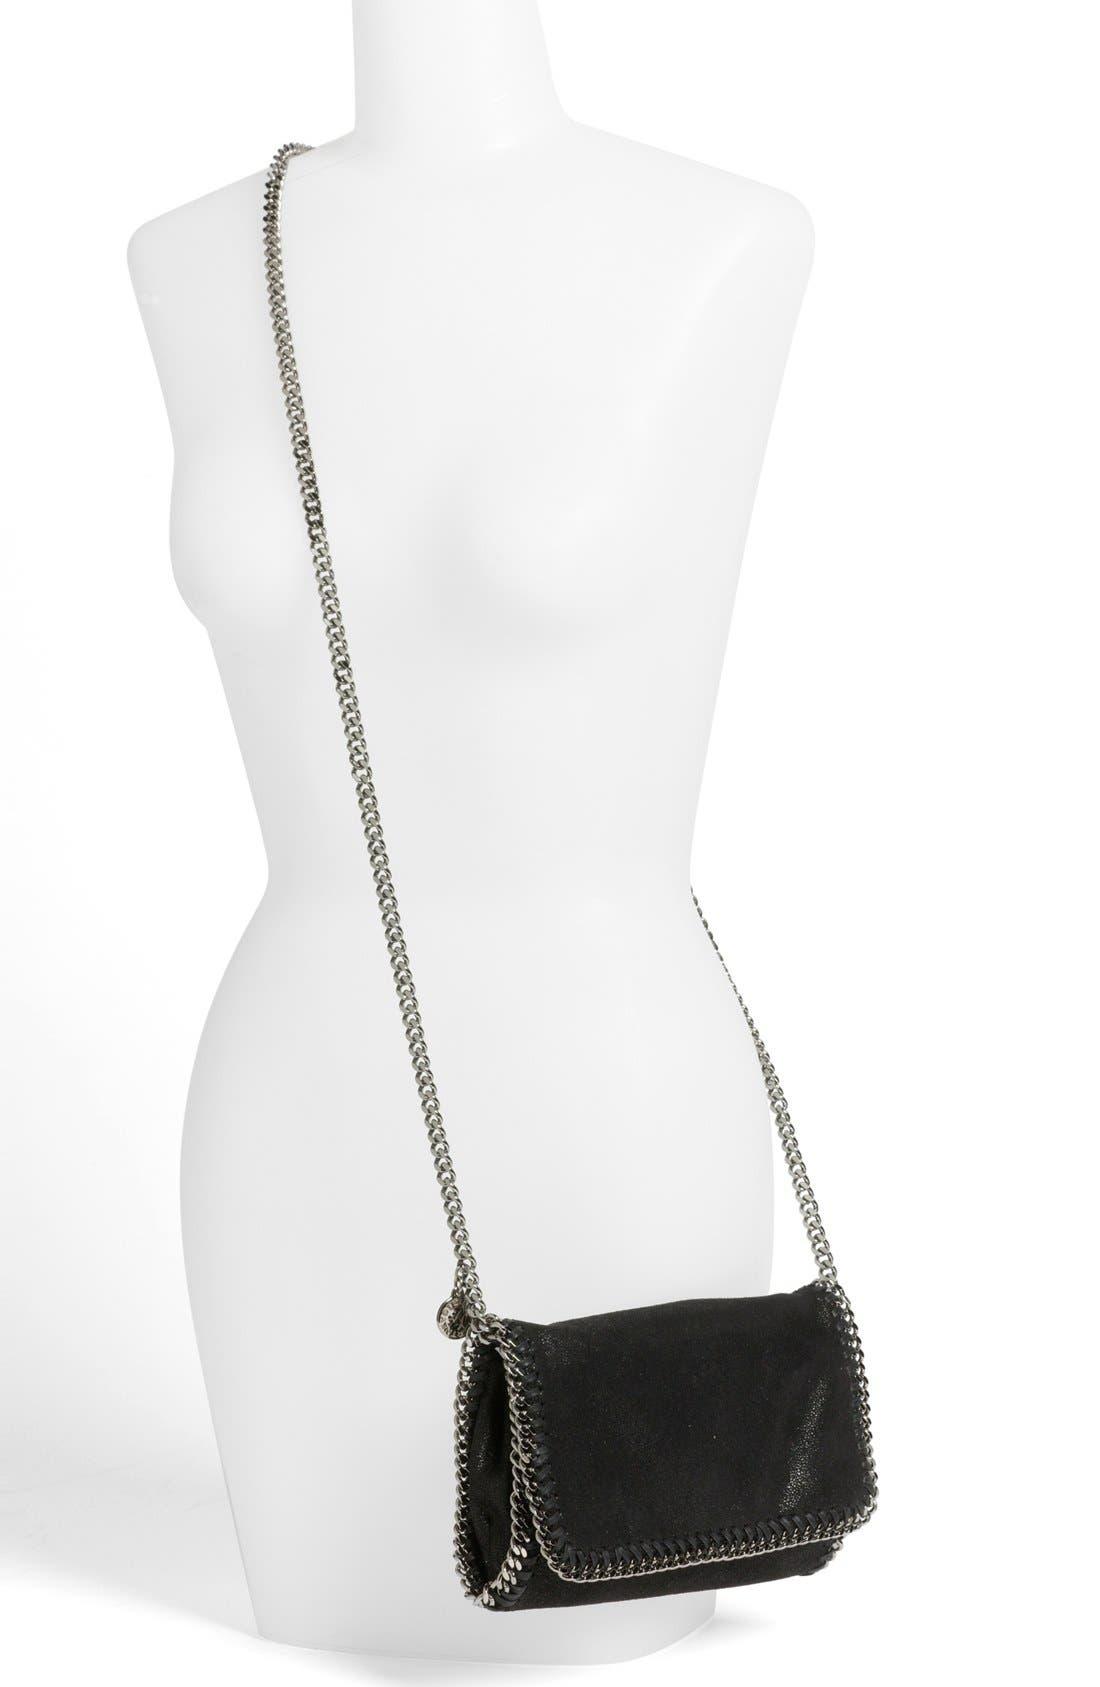 'Falabella - Shaggy Deer' Faux Leather Crossbody Bag,                             Alternate thumbnail 2, color,                             Black Slvr Hrdwr